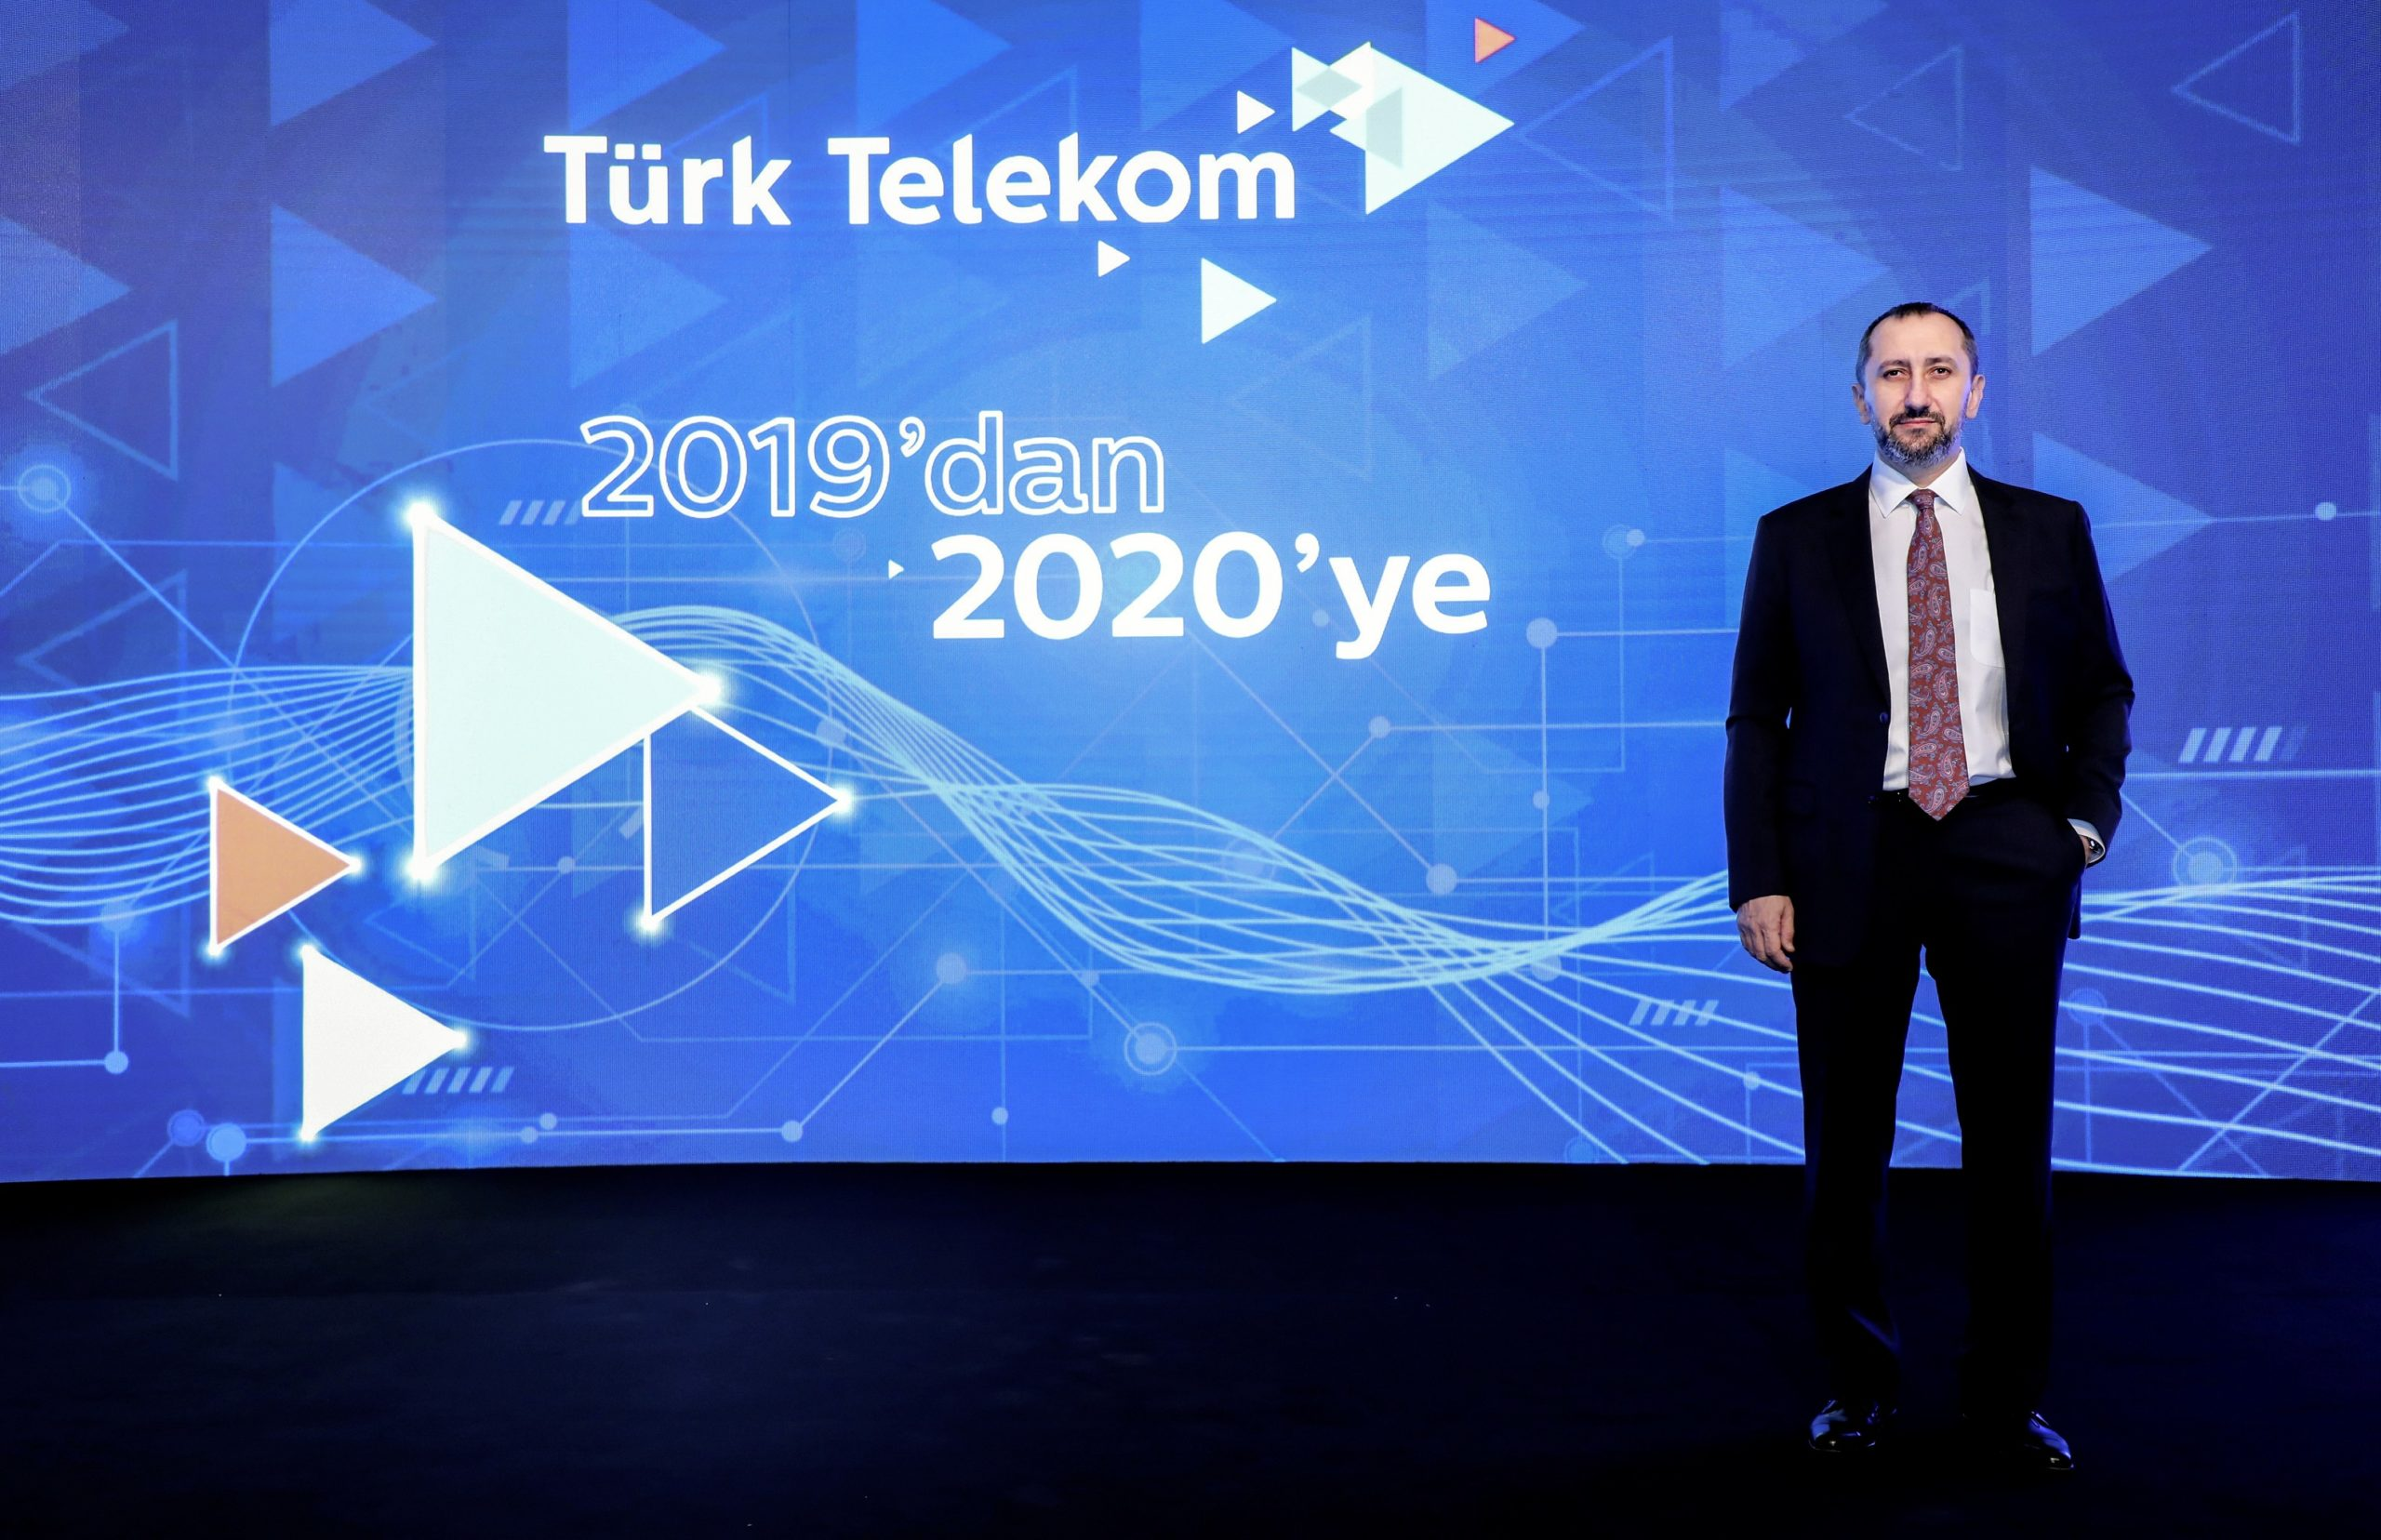 Photo of Türk Telekom'dan 2,4 milyar TL kâr